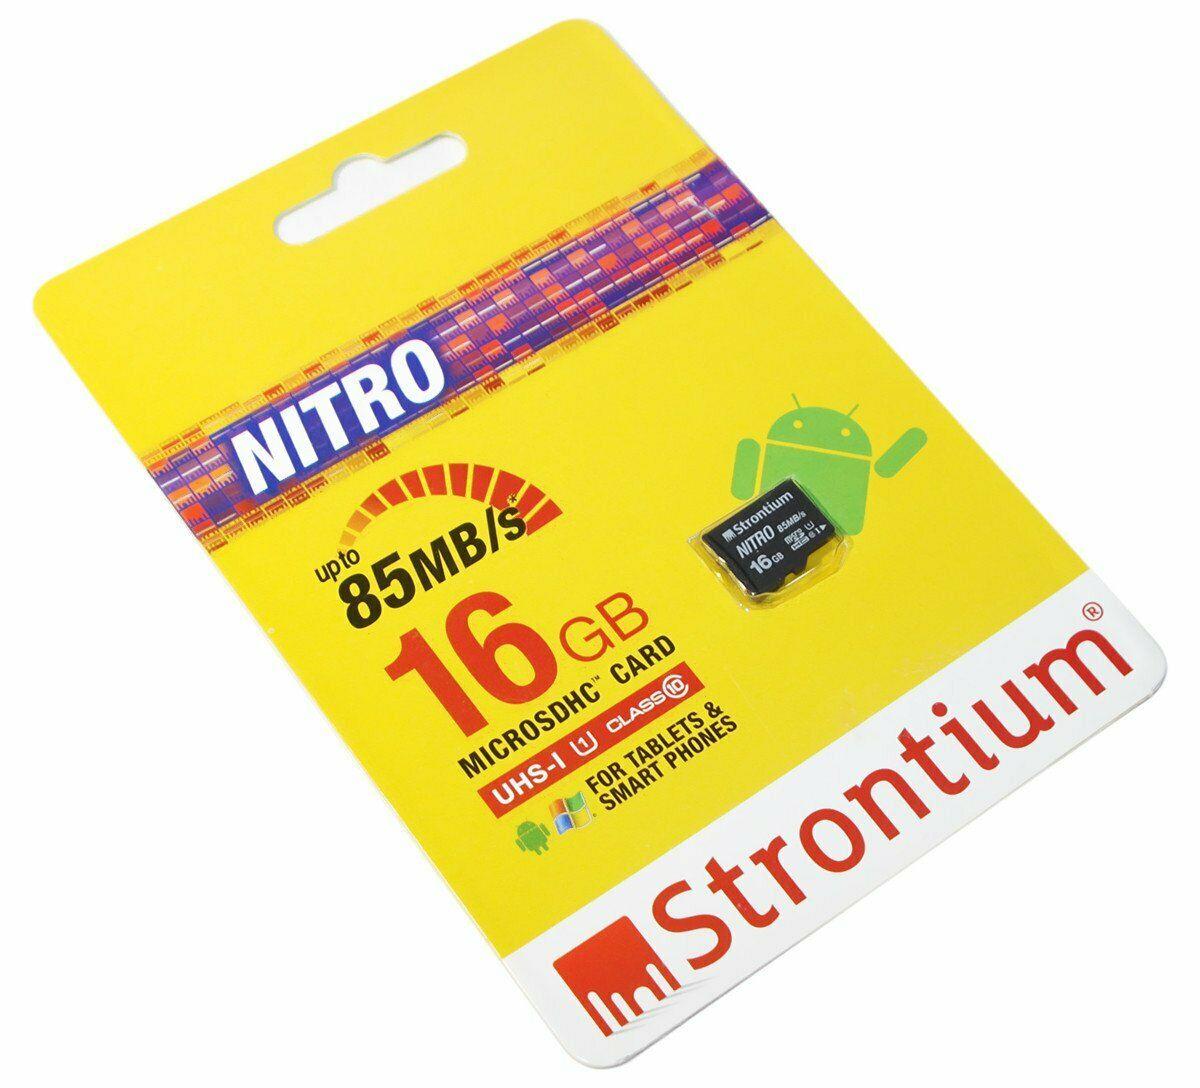 Strontium NITRO 16  GB 32  GB MicroSDHC Flash Card U1 Class 10 85MB/s lot by Stelcore